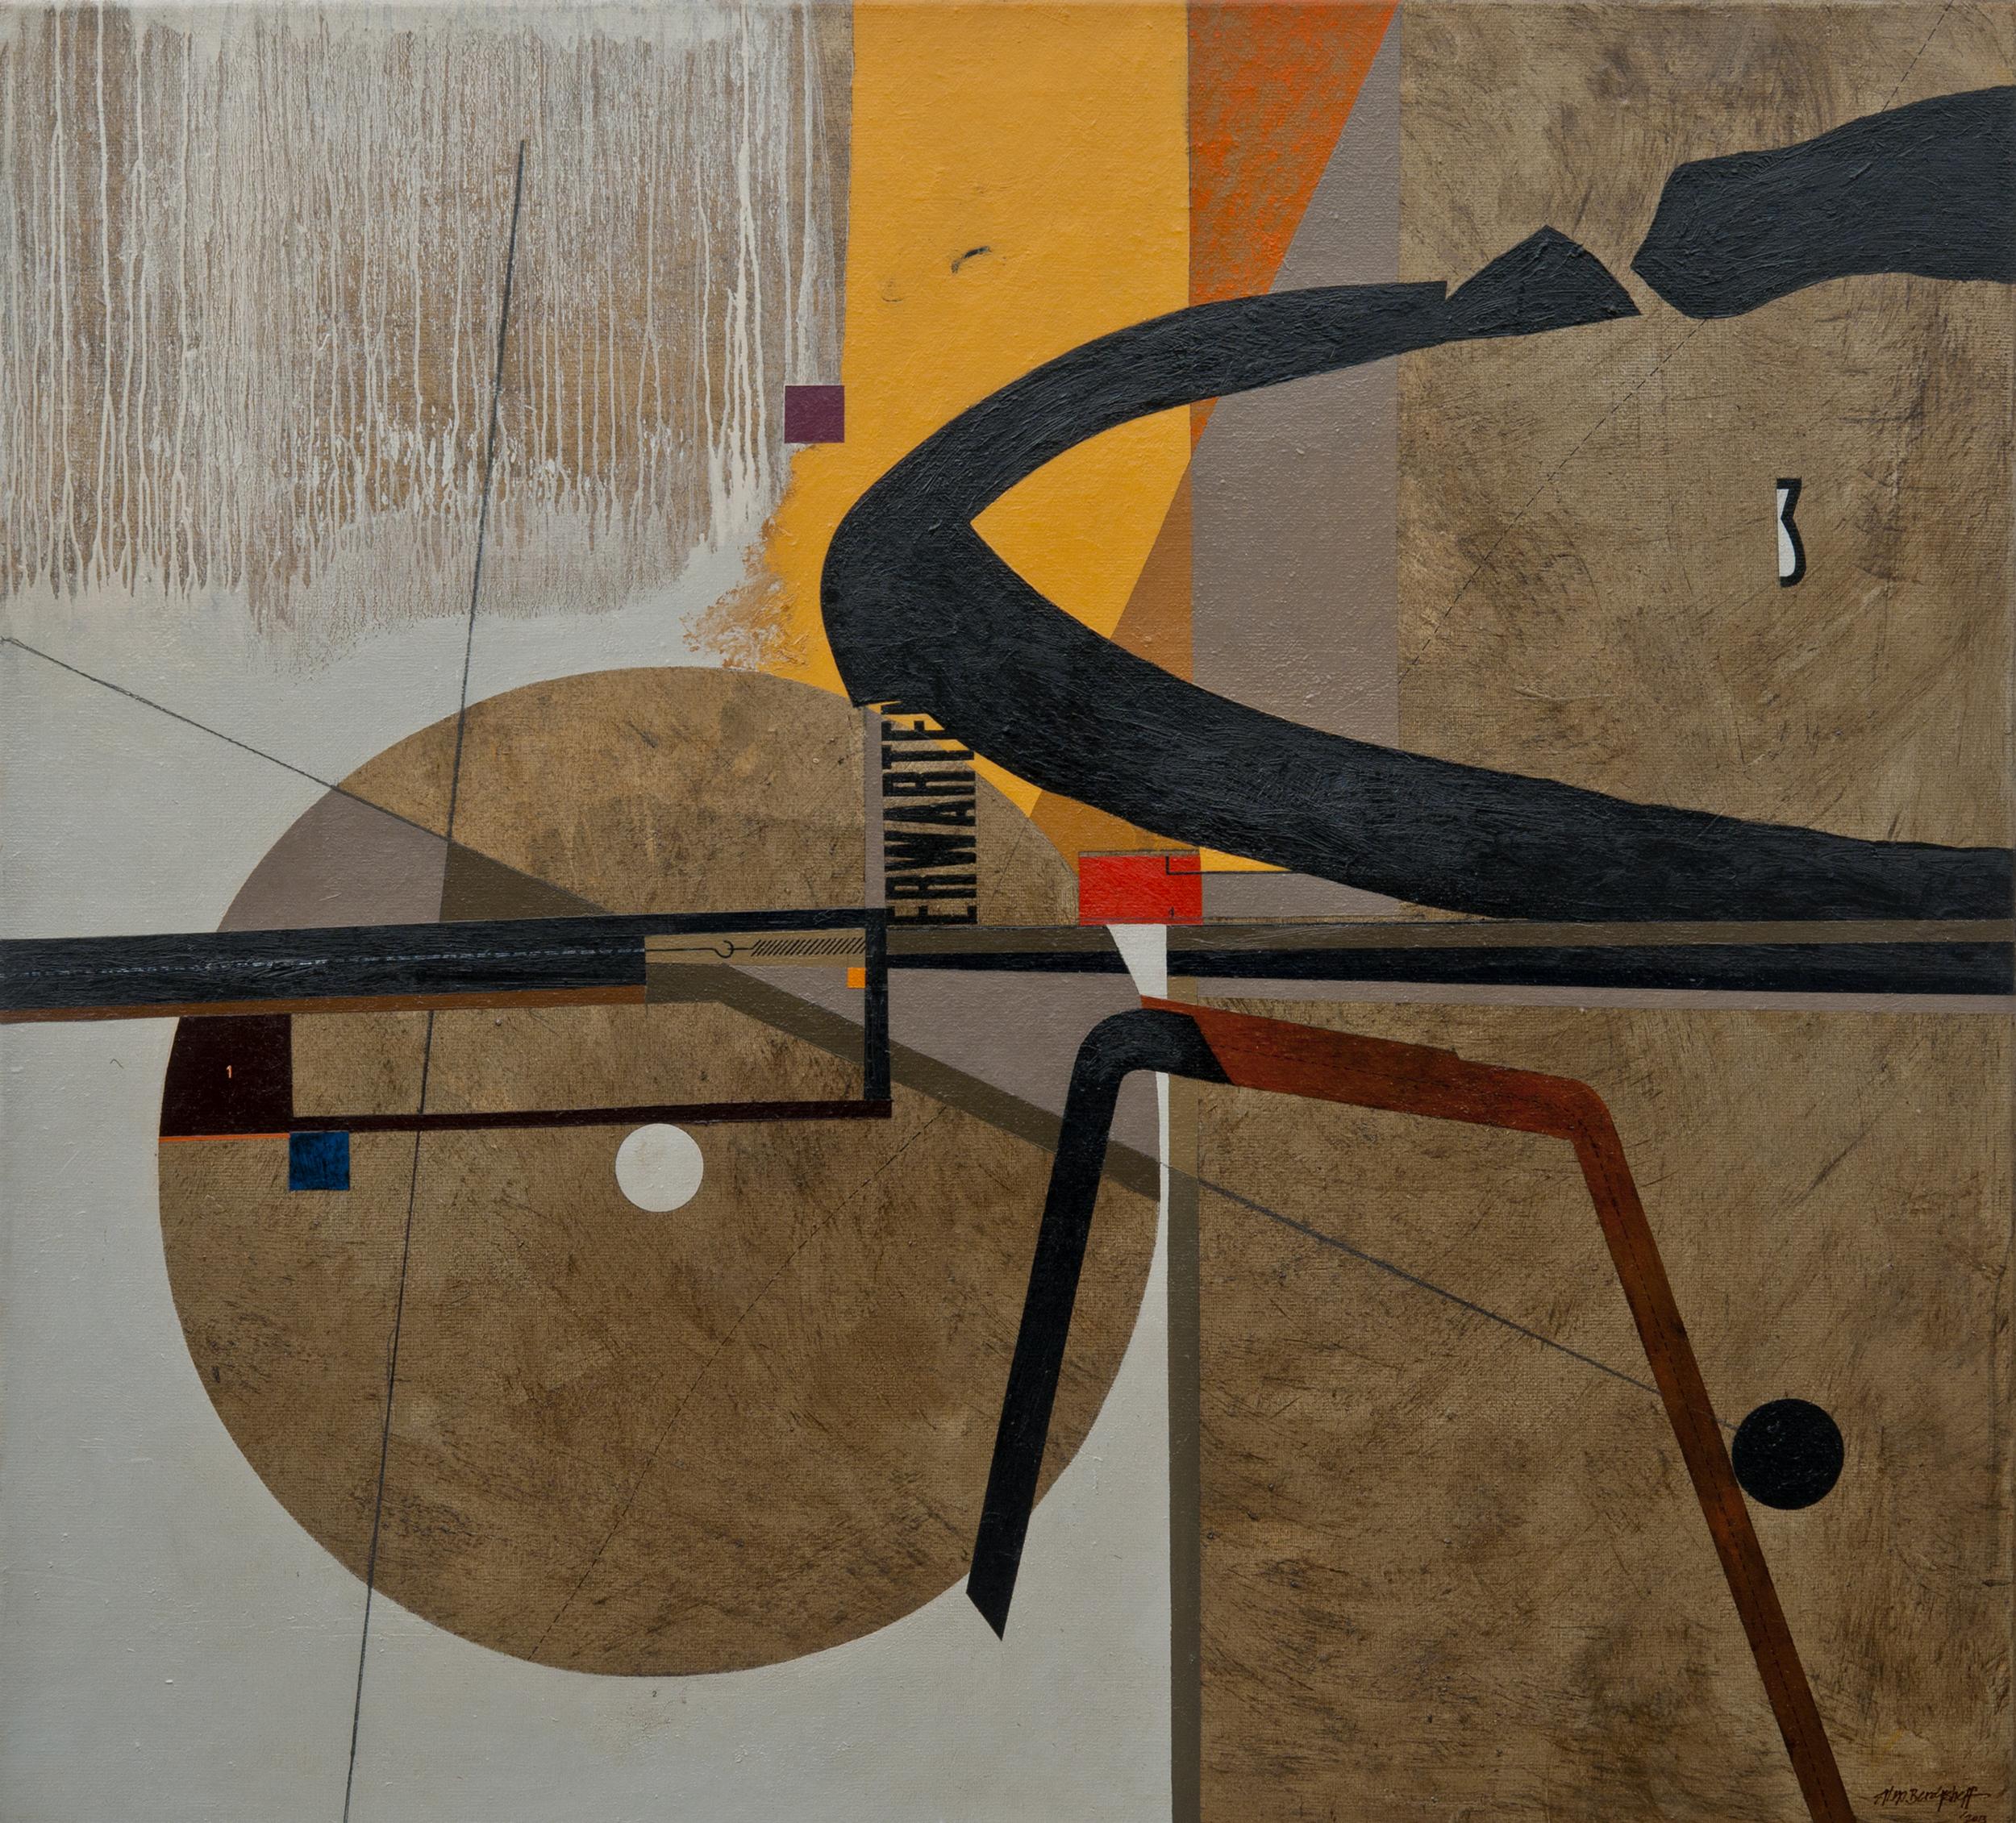 Inner Mechanics of Tensive Expectation, oil on canvas, 110x120 cm, 2013